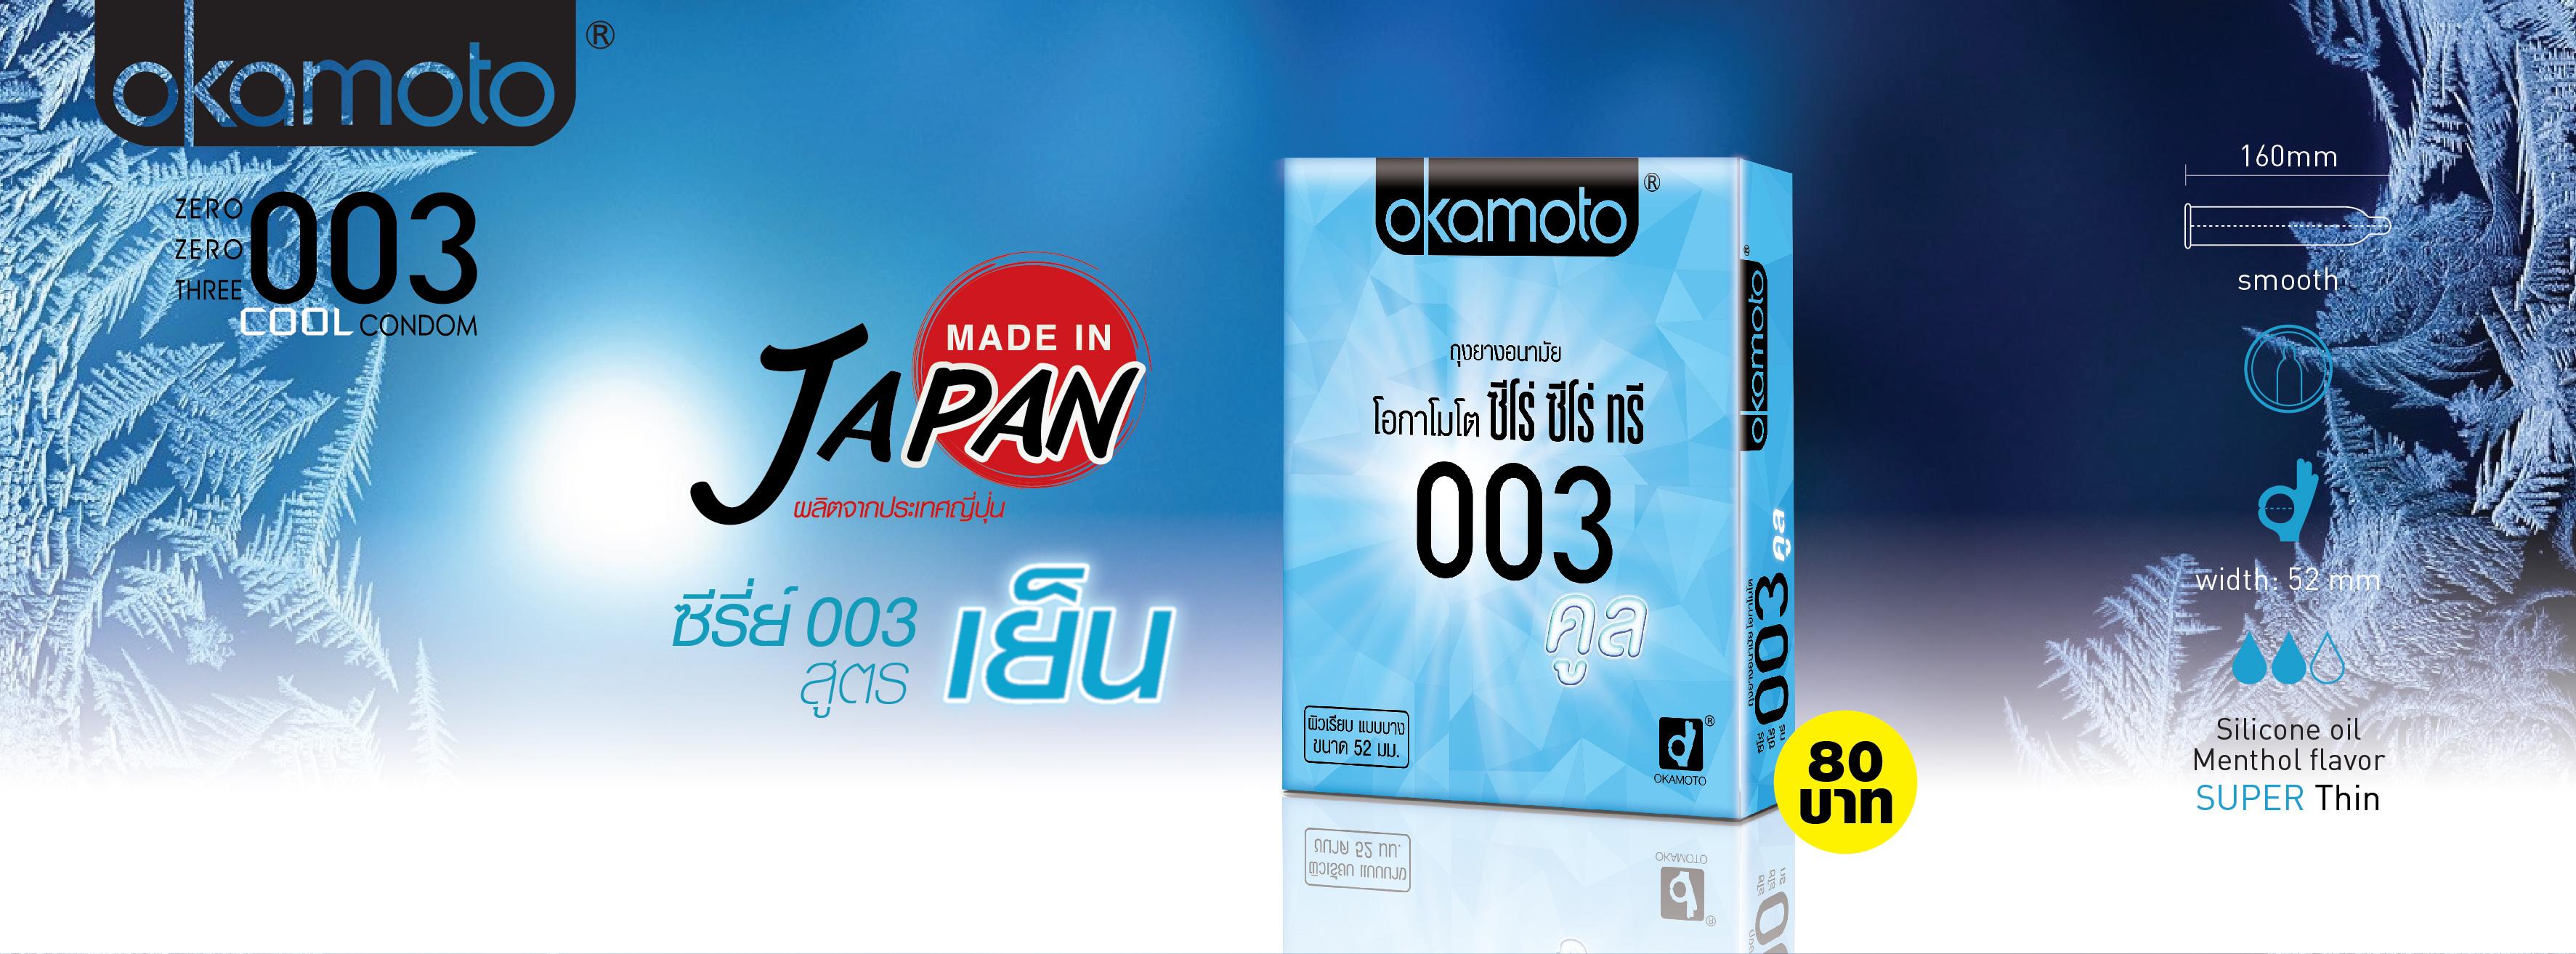 Okamoto 003 Cool